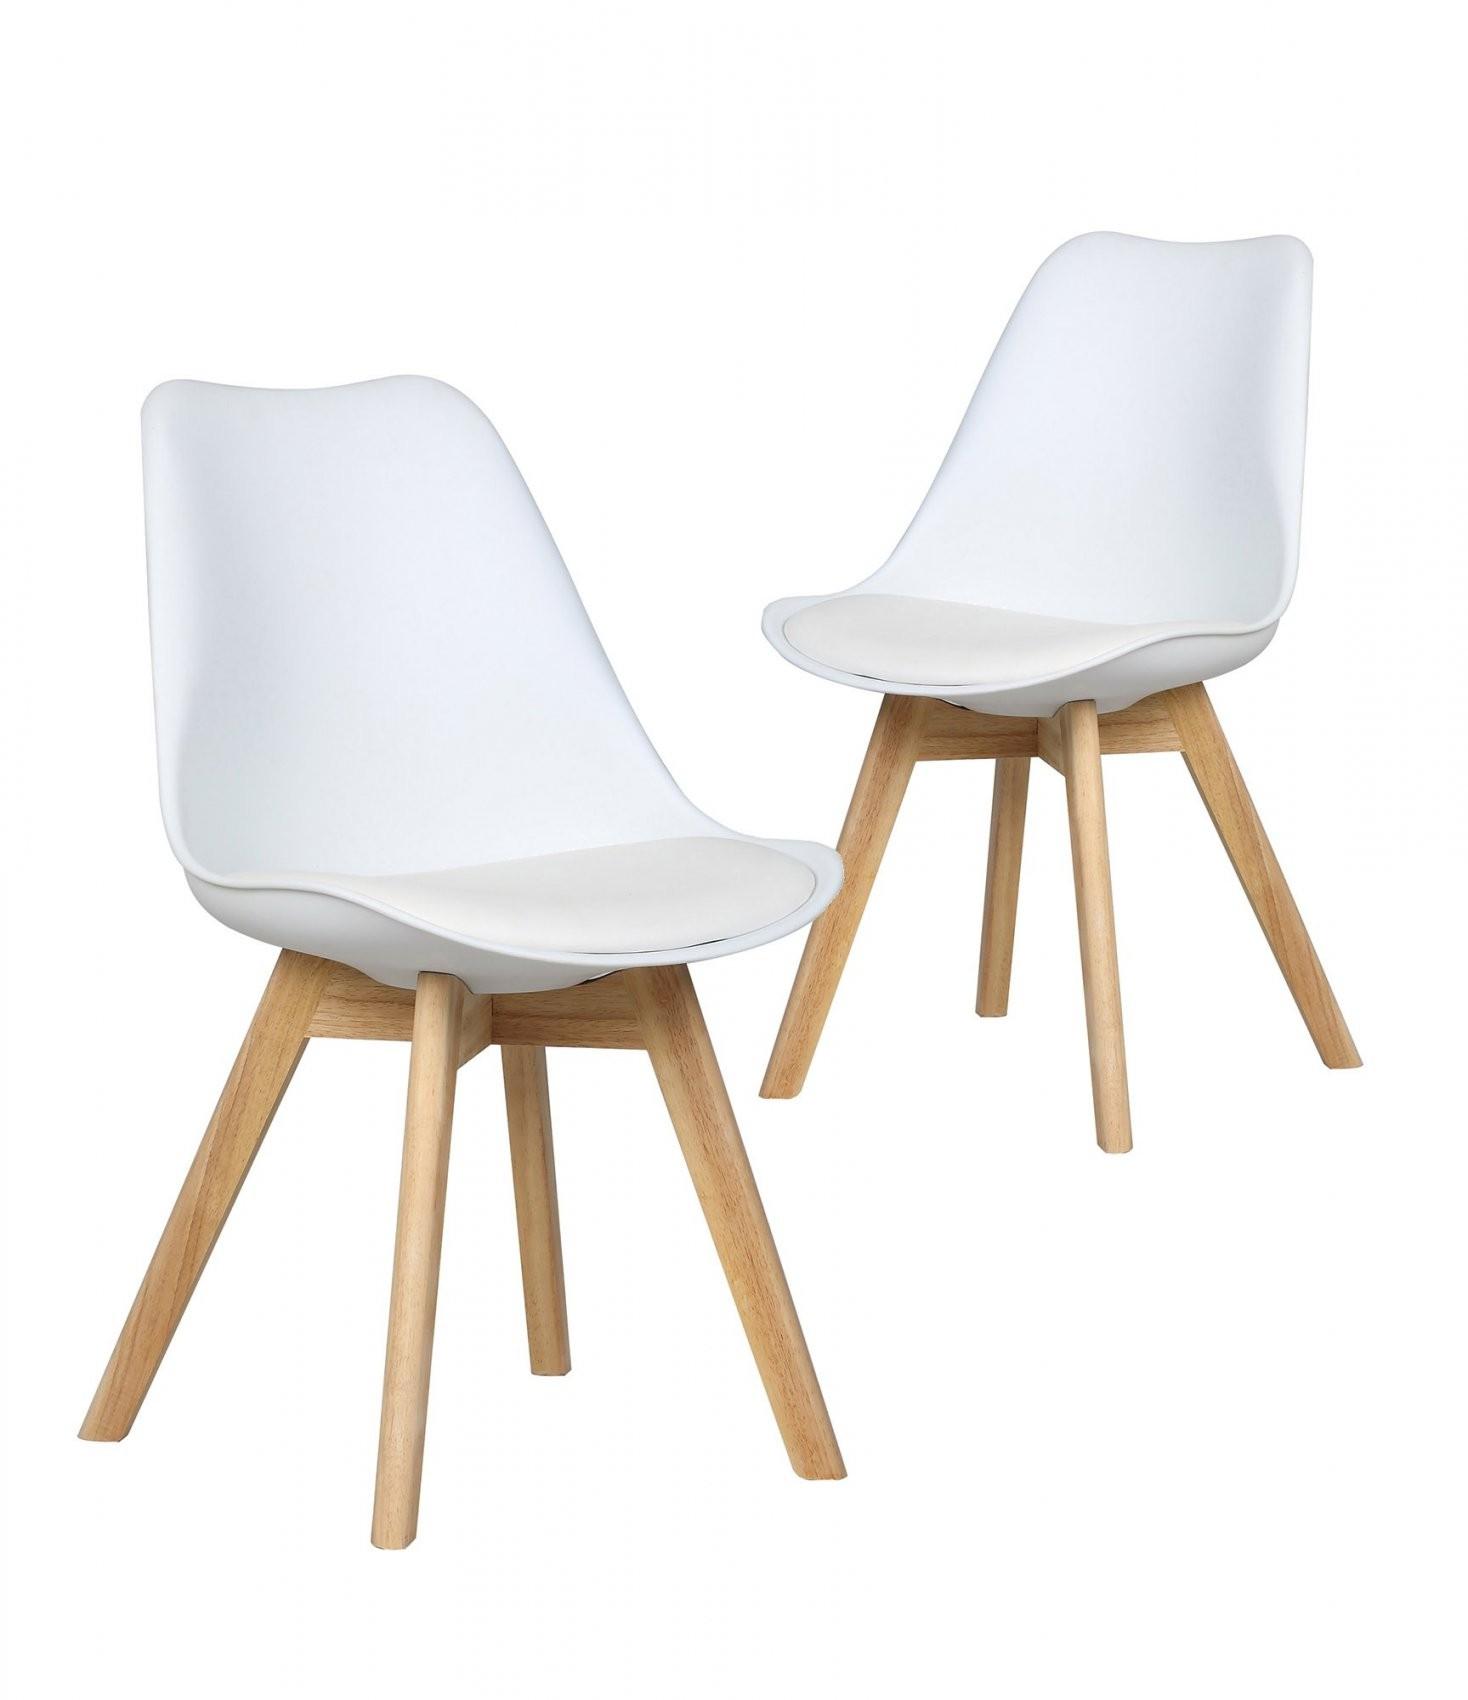 Stühle Malmö  Set (2 Stühle Skandinavisches Design  Weiß Konnte von Stühle Skandinavisches Design Photo